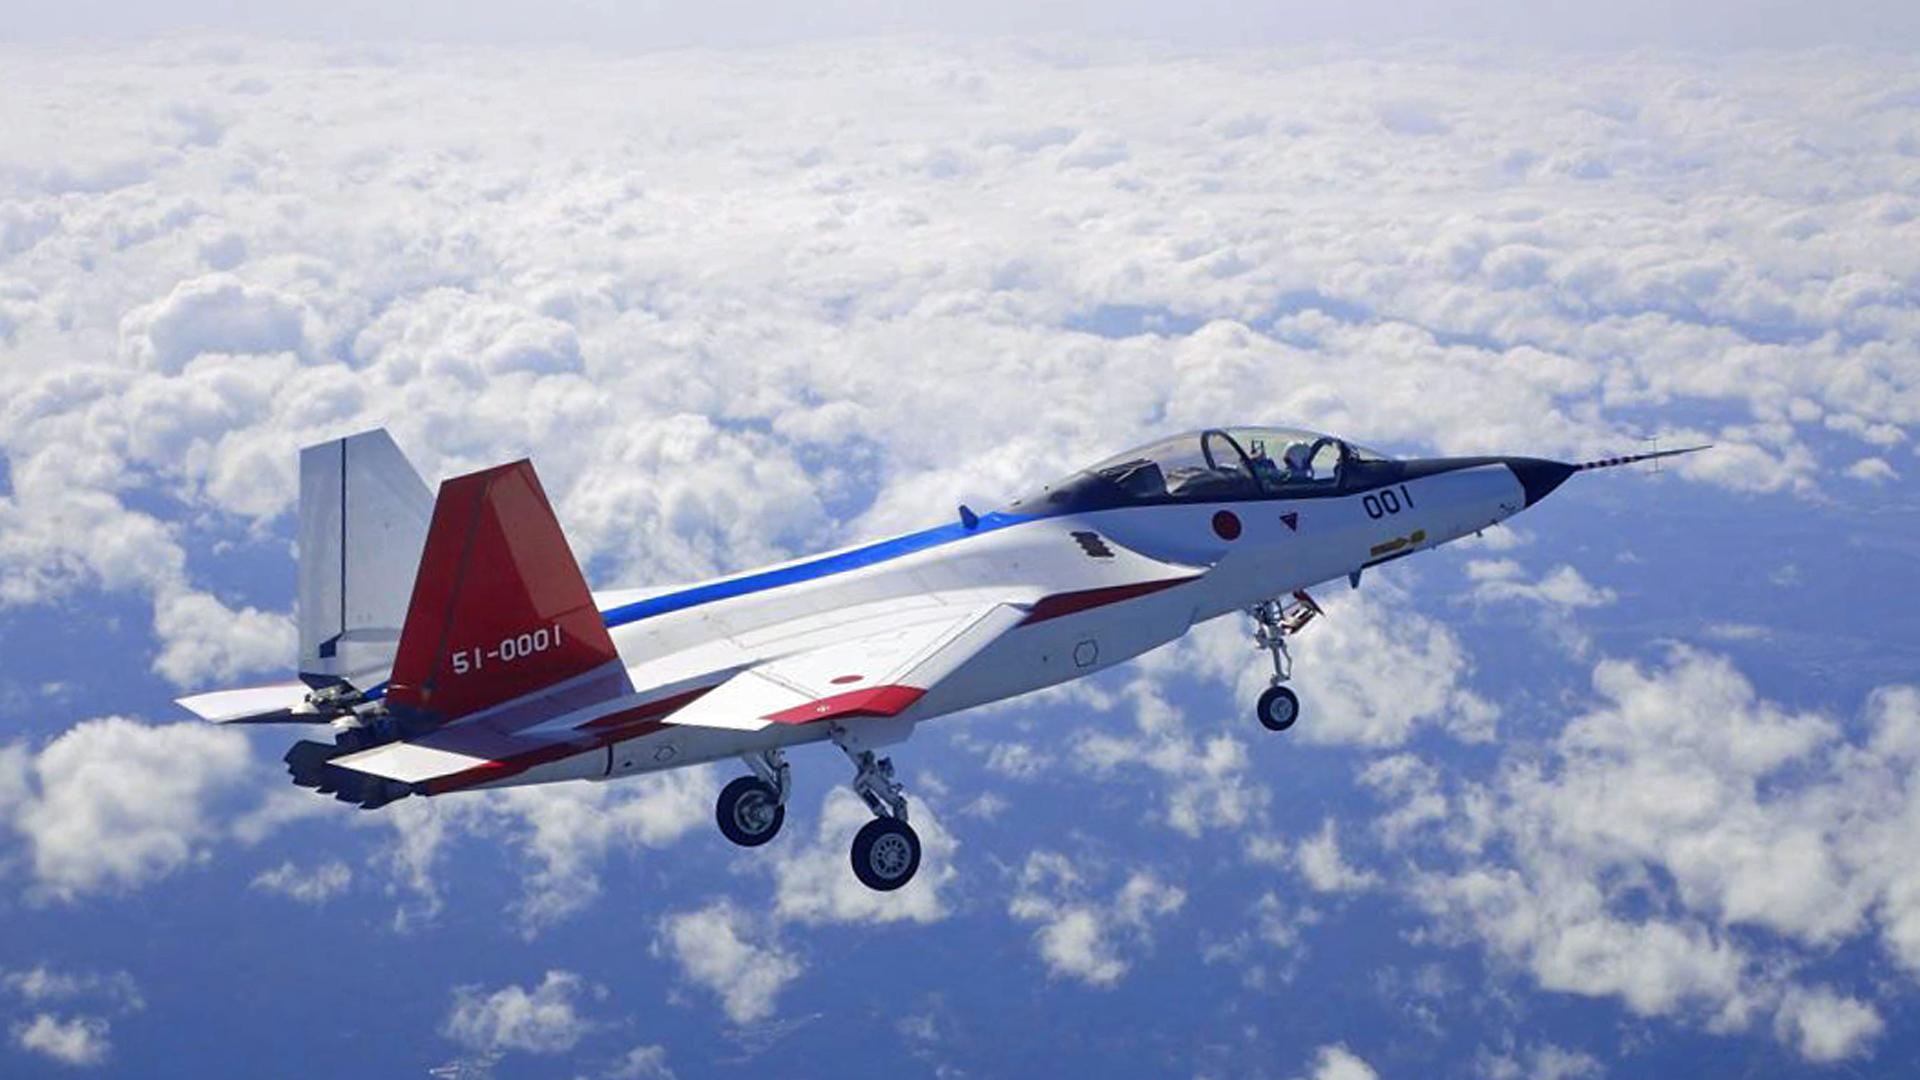 X-2 (航空機・日本) - Wikipedia